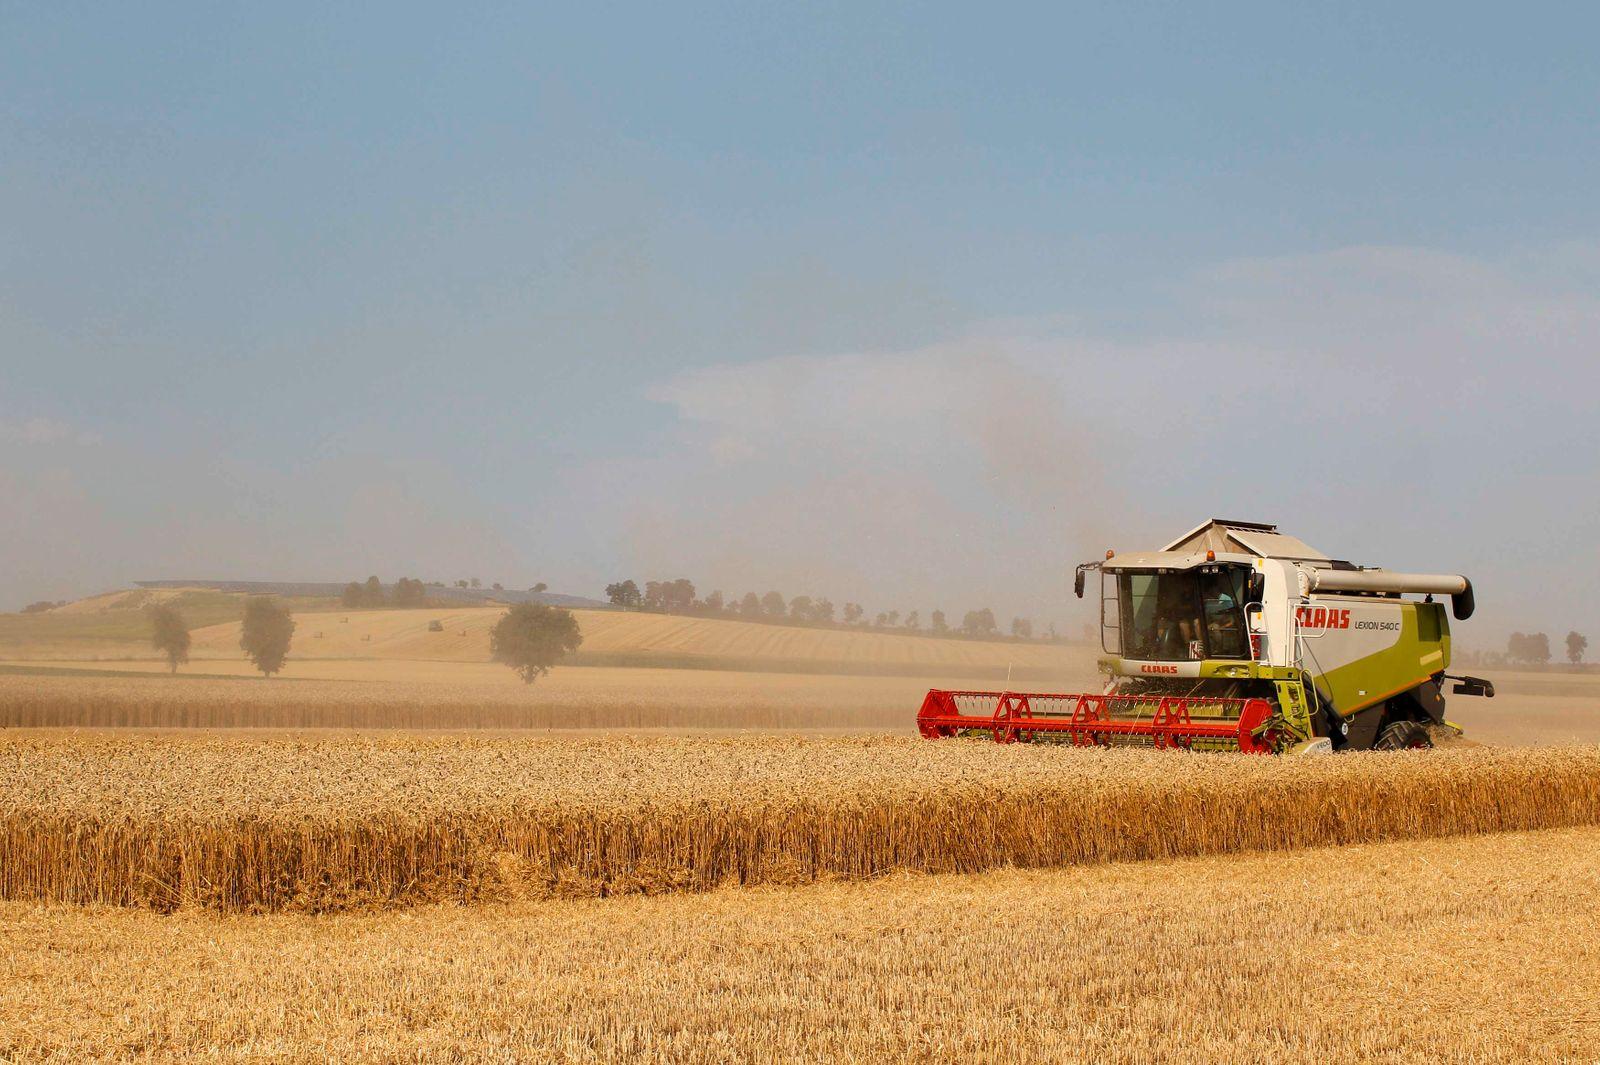 Combine harvester reaps winter wheat at field in Koesching near Ingolstadt